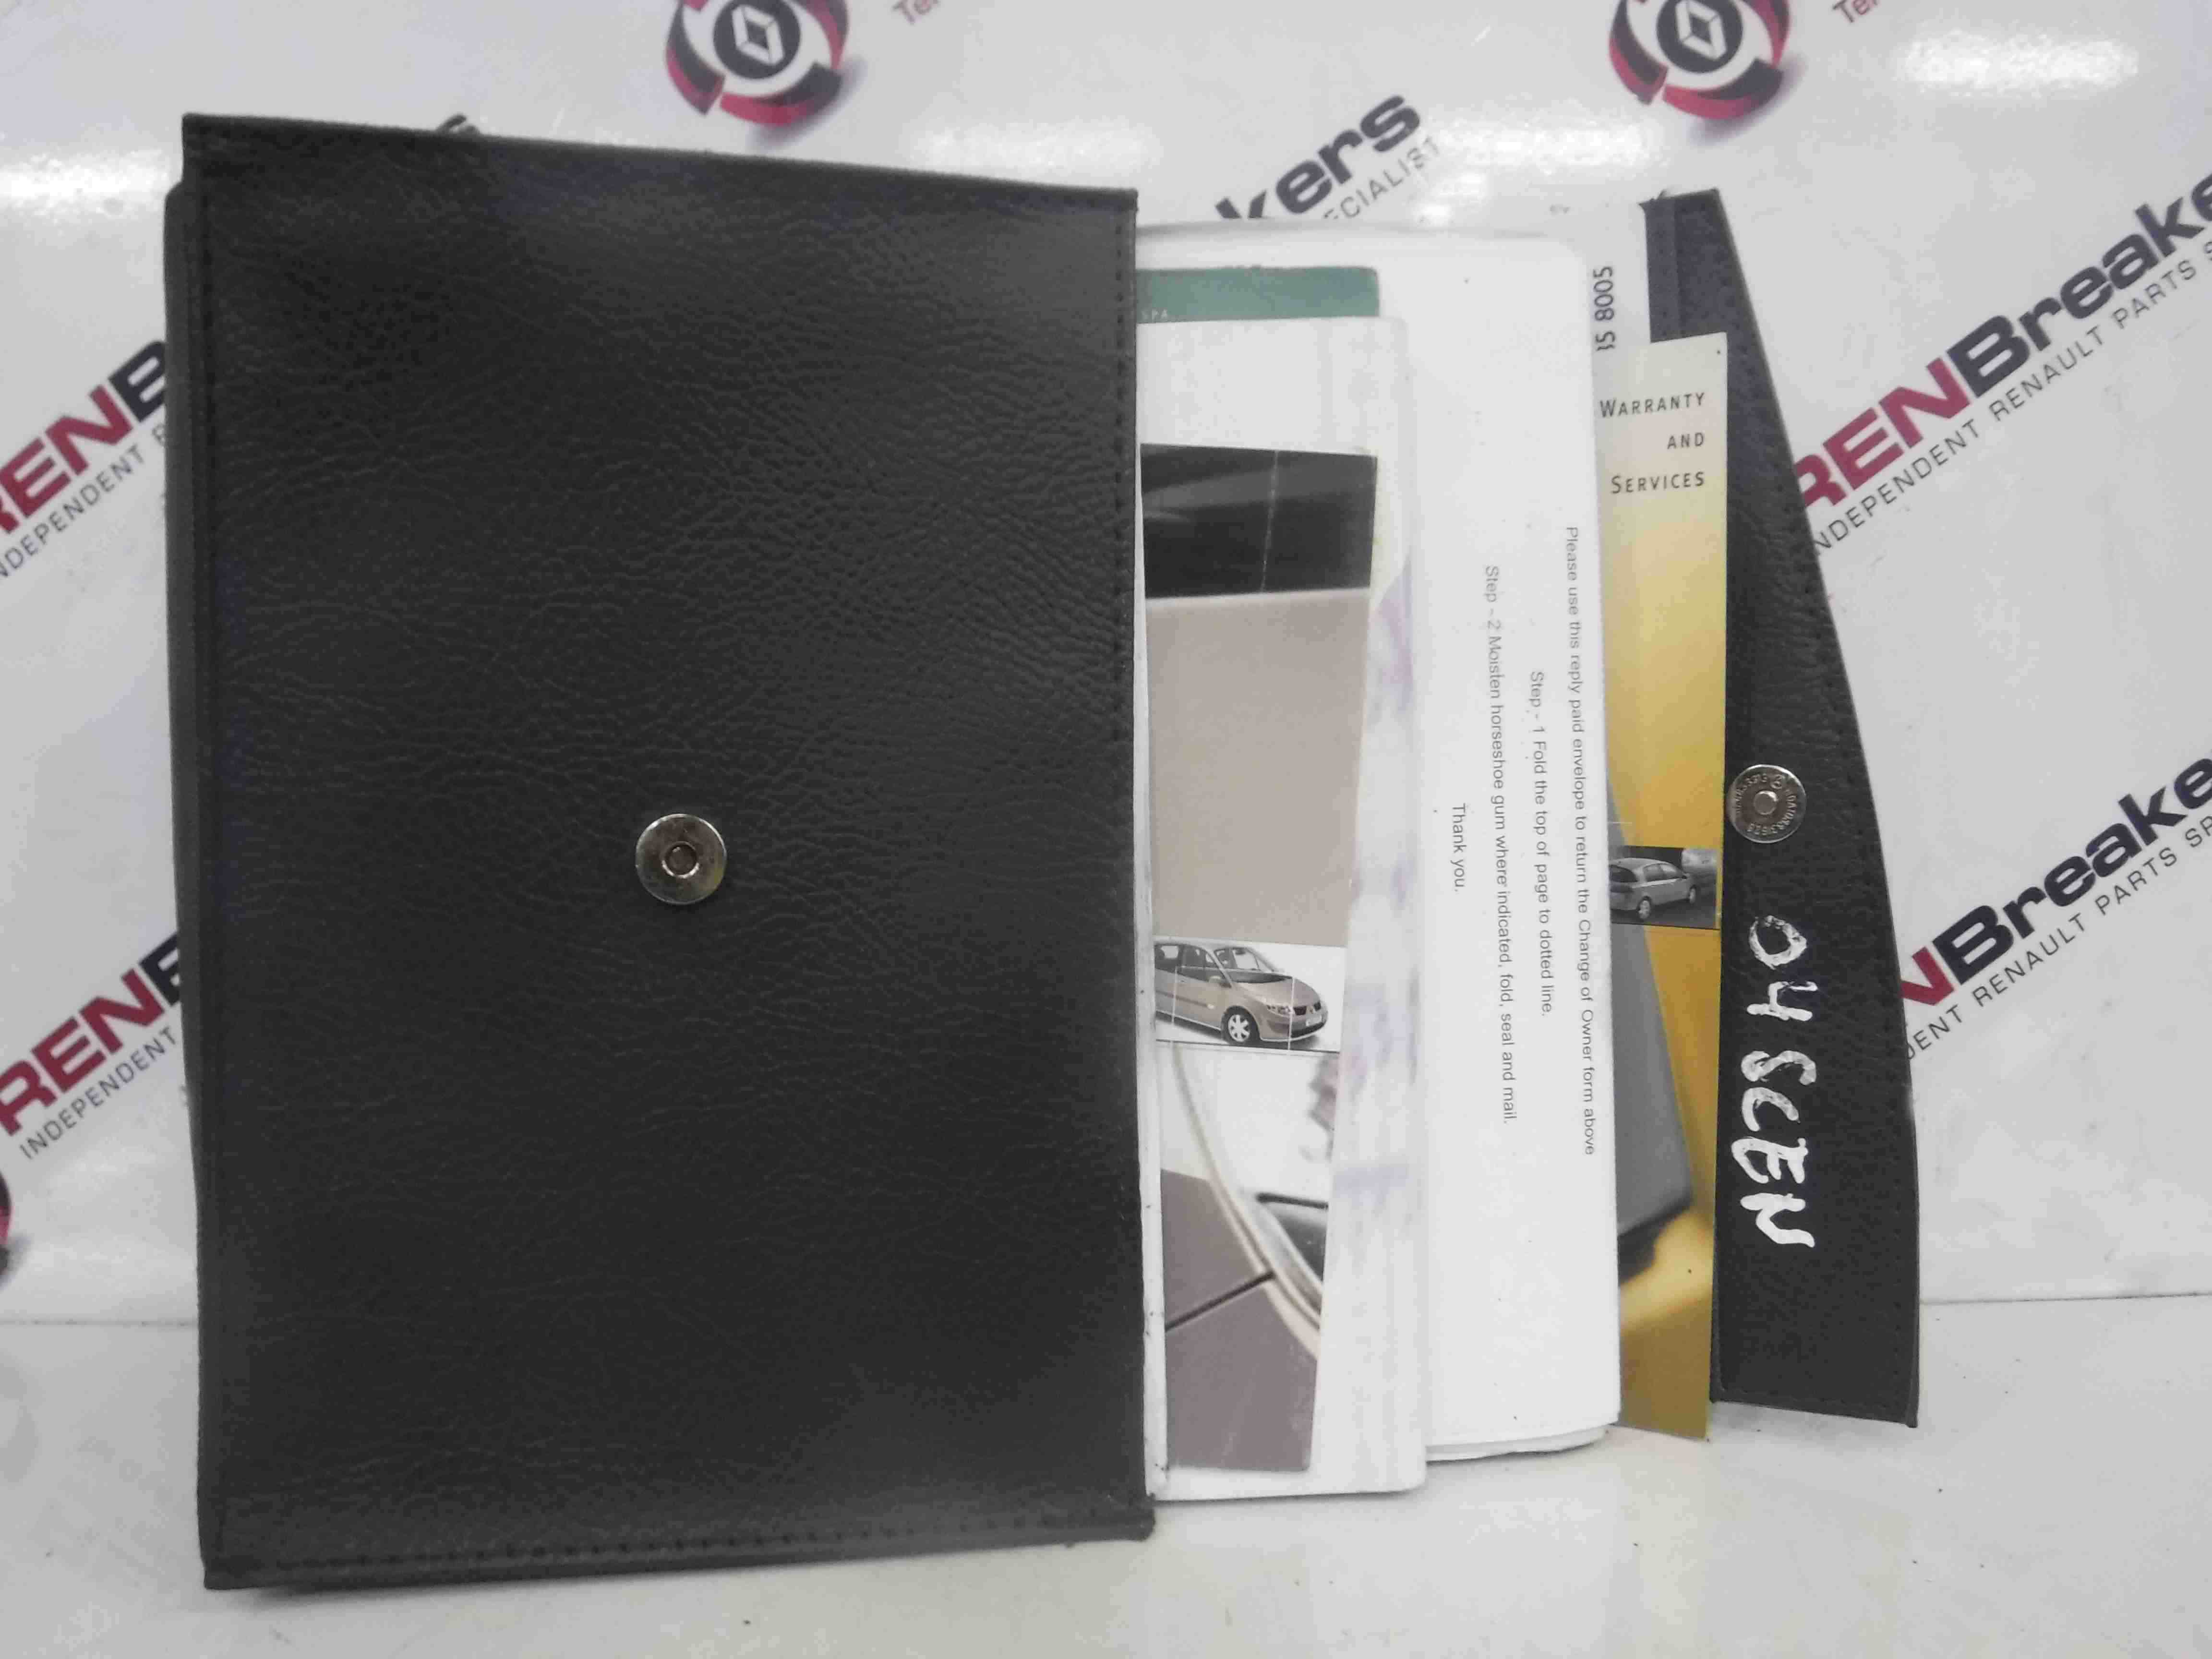 Renault Scenic 2003-2009 Documents + Holders Handbook Manual